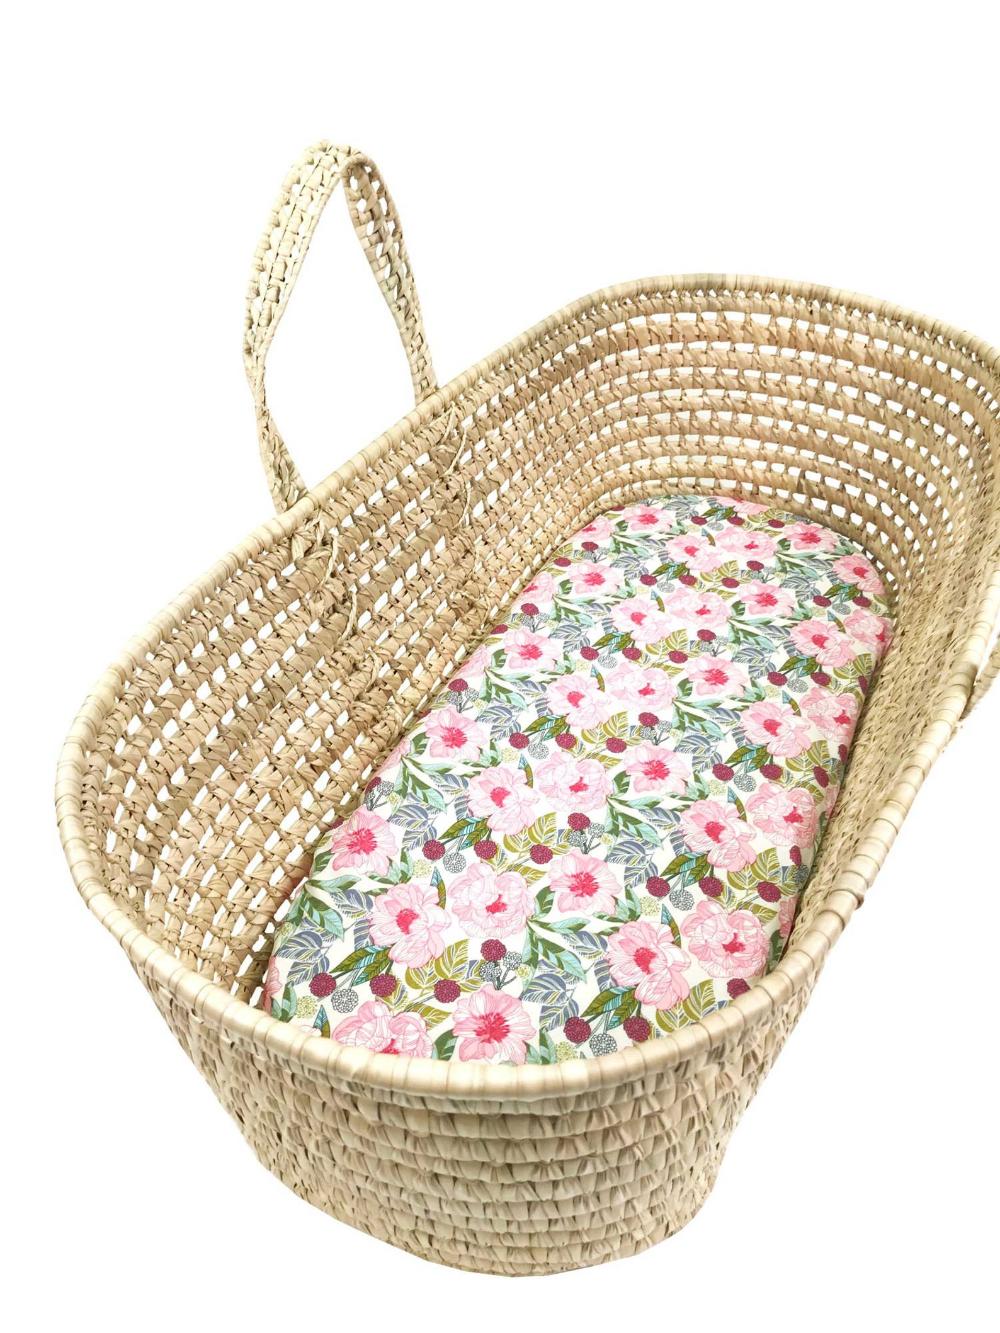 Pink and Green Large Floral Fitted Sheet Moses Basket  Bassinet  Cradle  Changing Basket